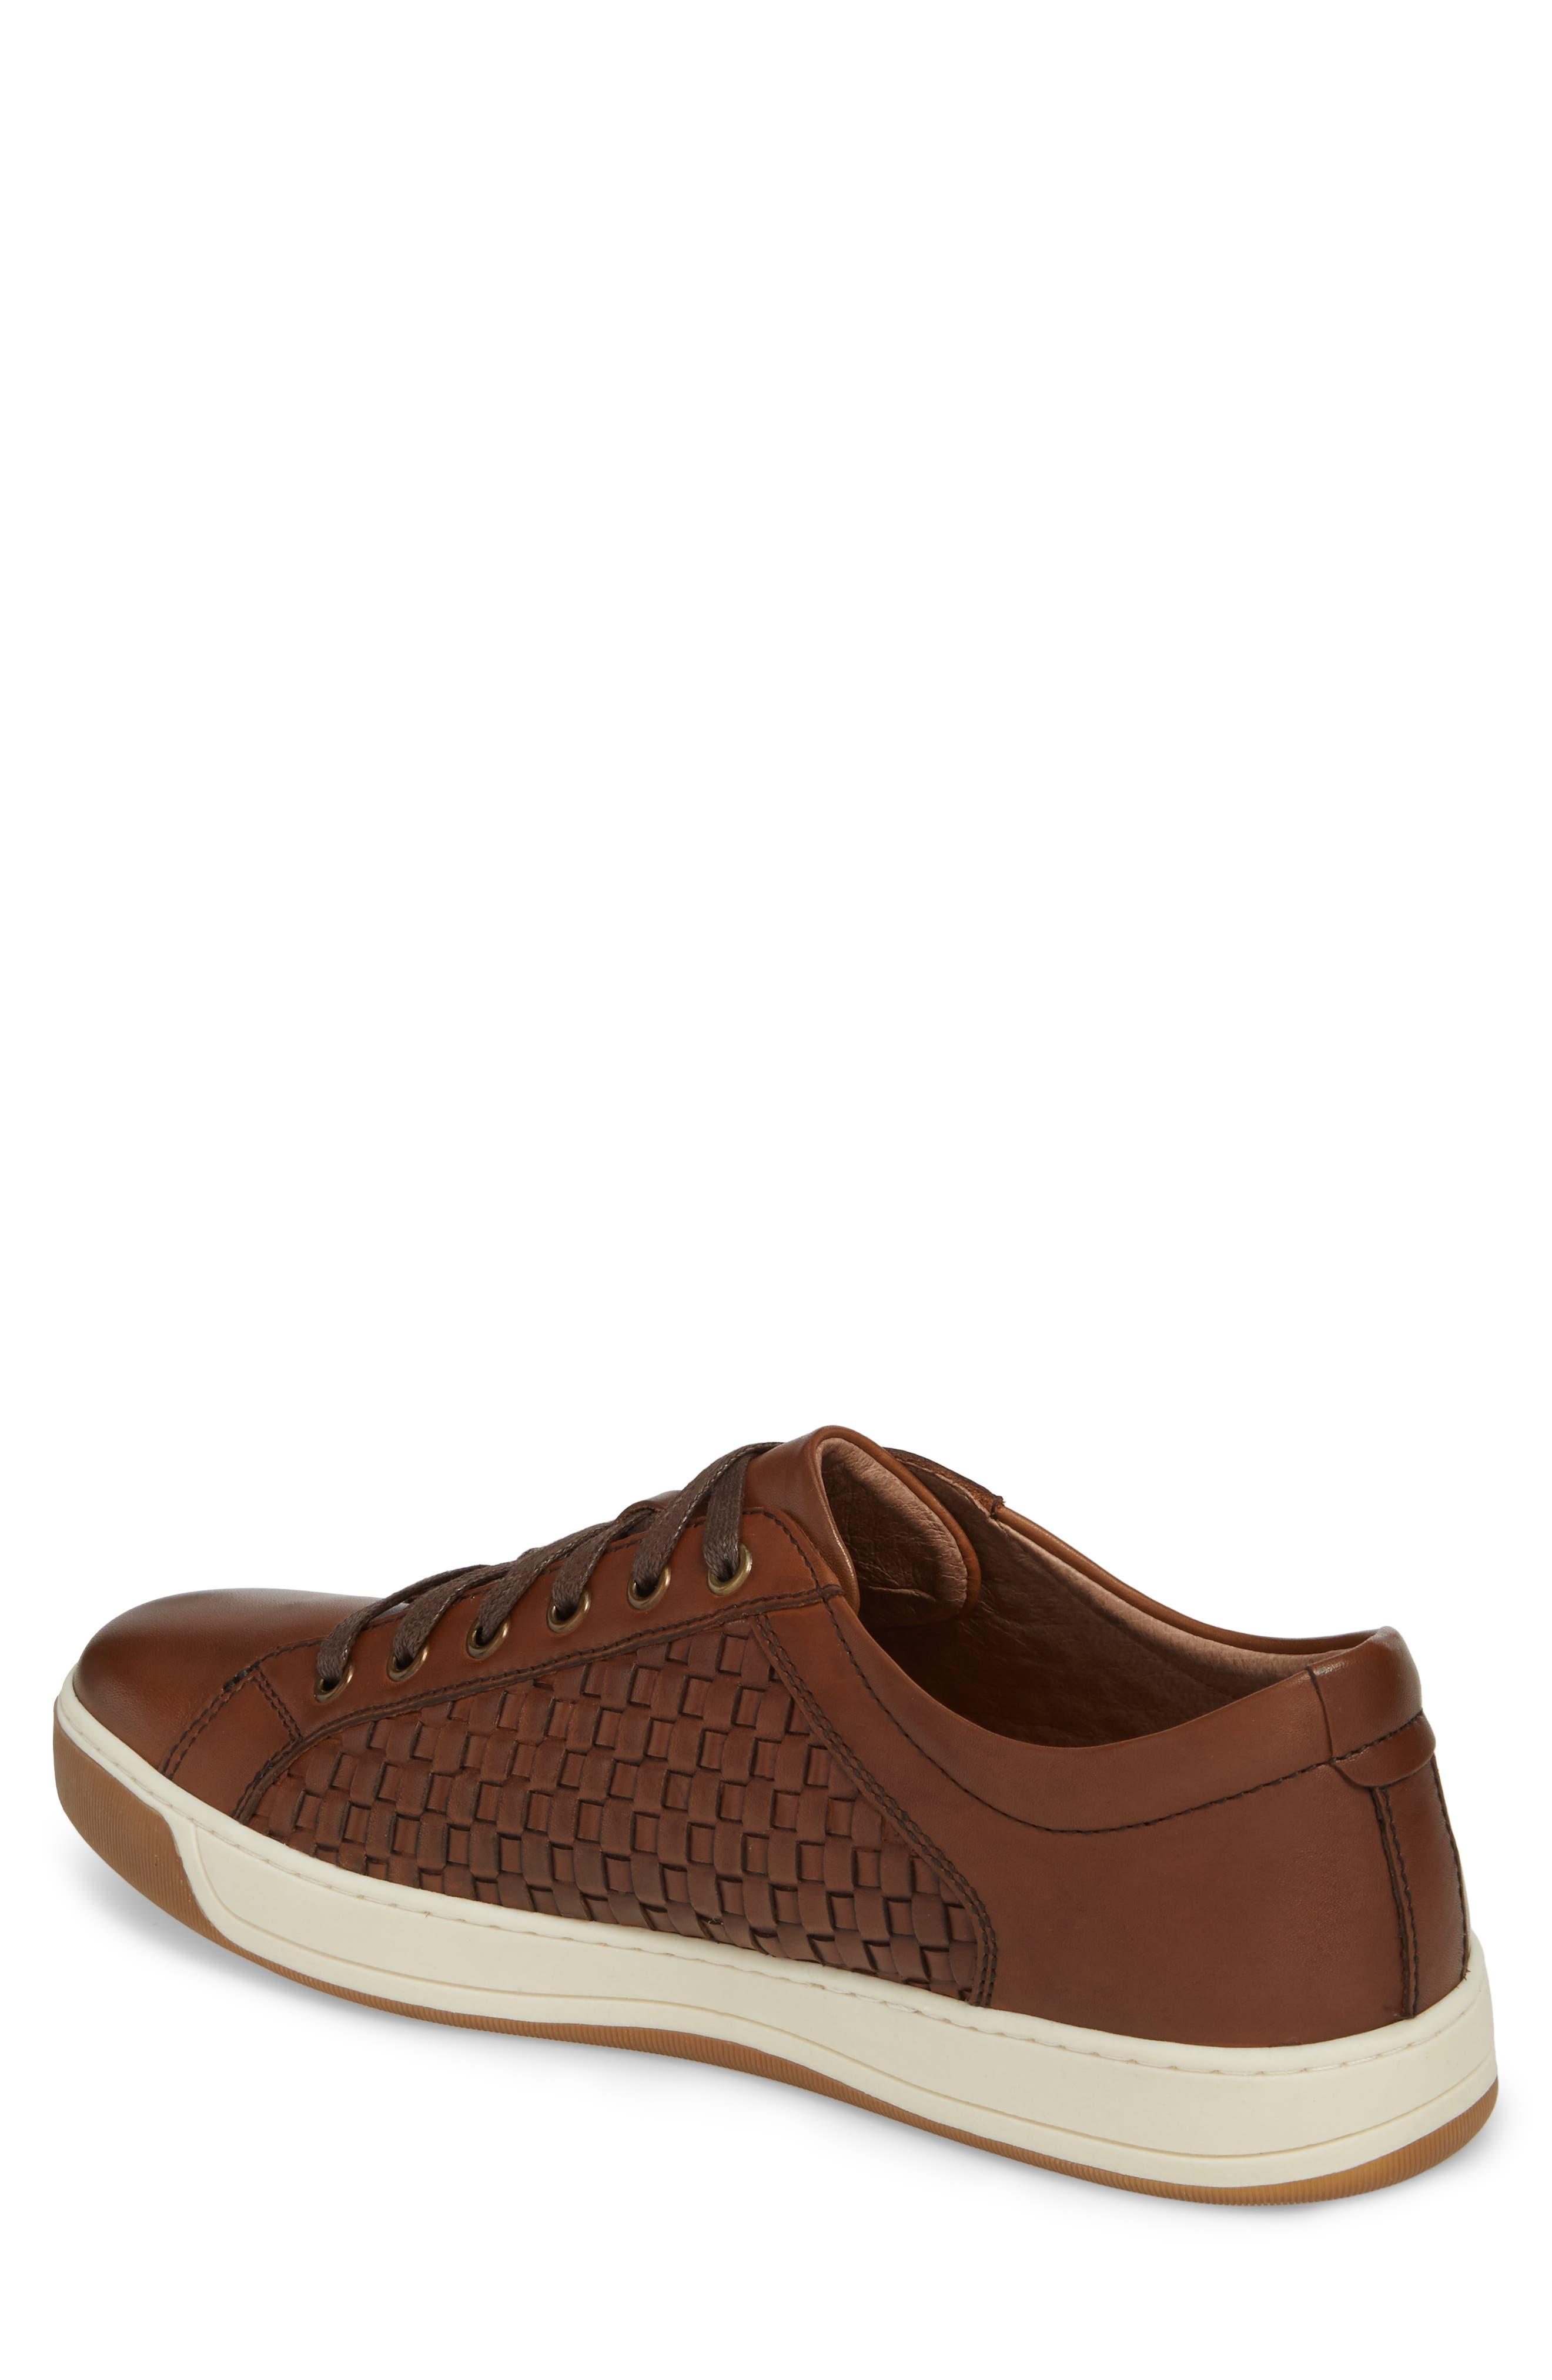 Allister Woven Low Top Sneaker,                             Alternate thumbnail 2, color,                             Brown